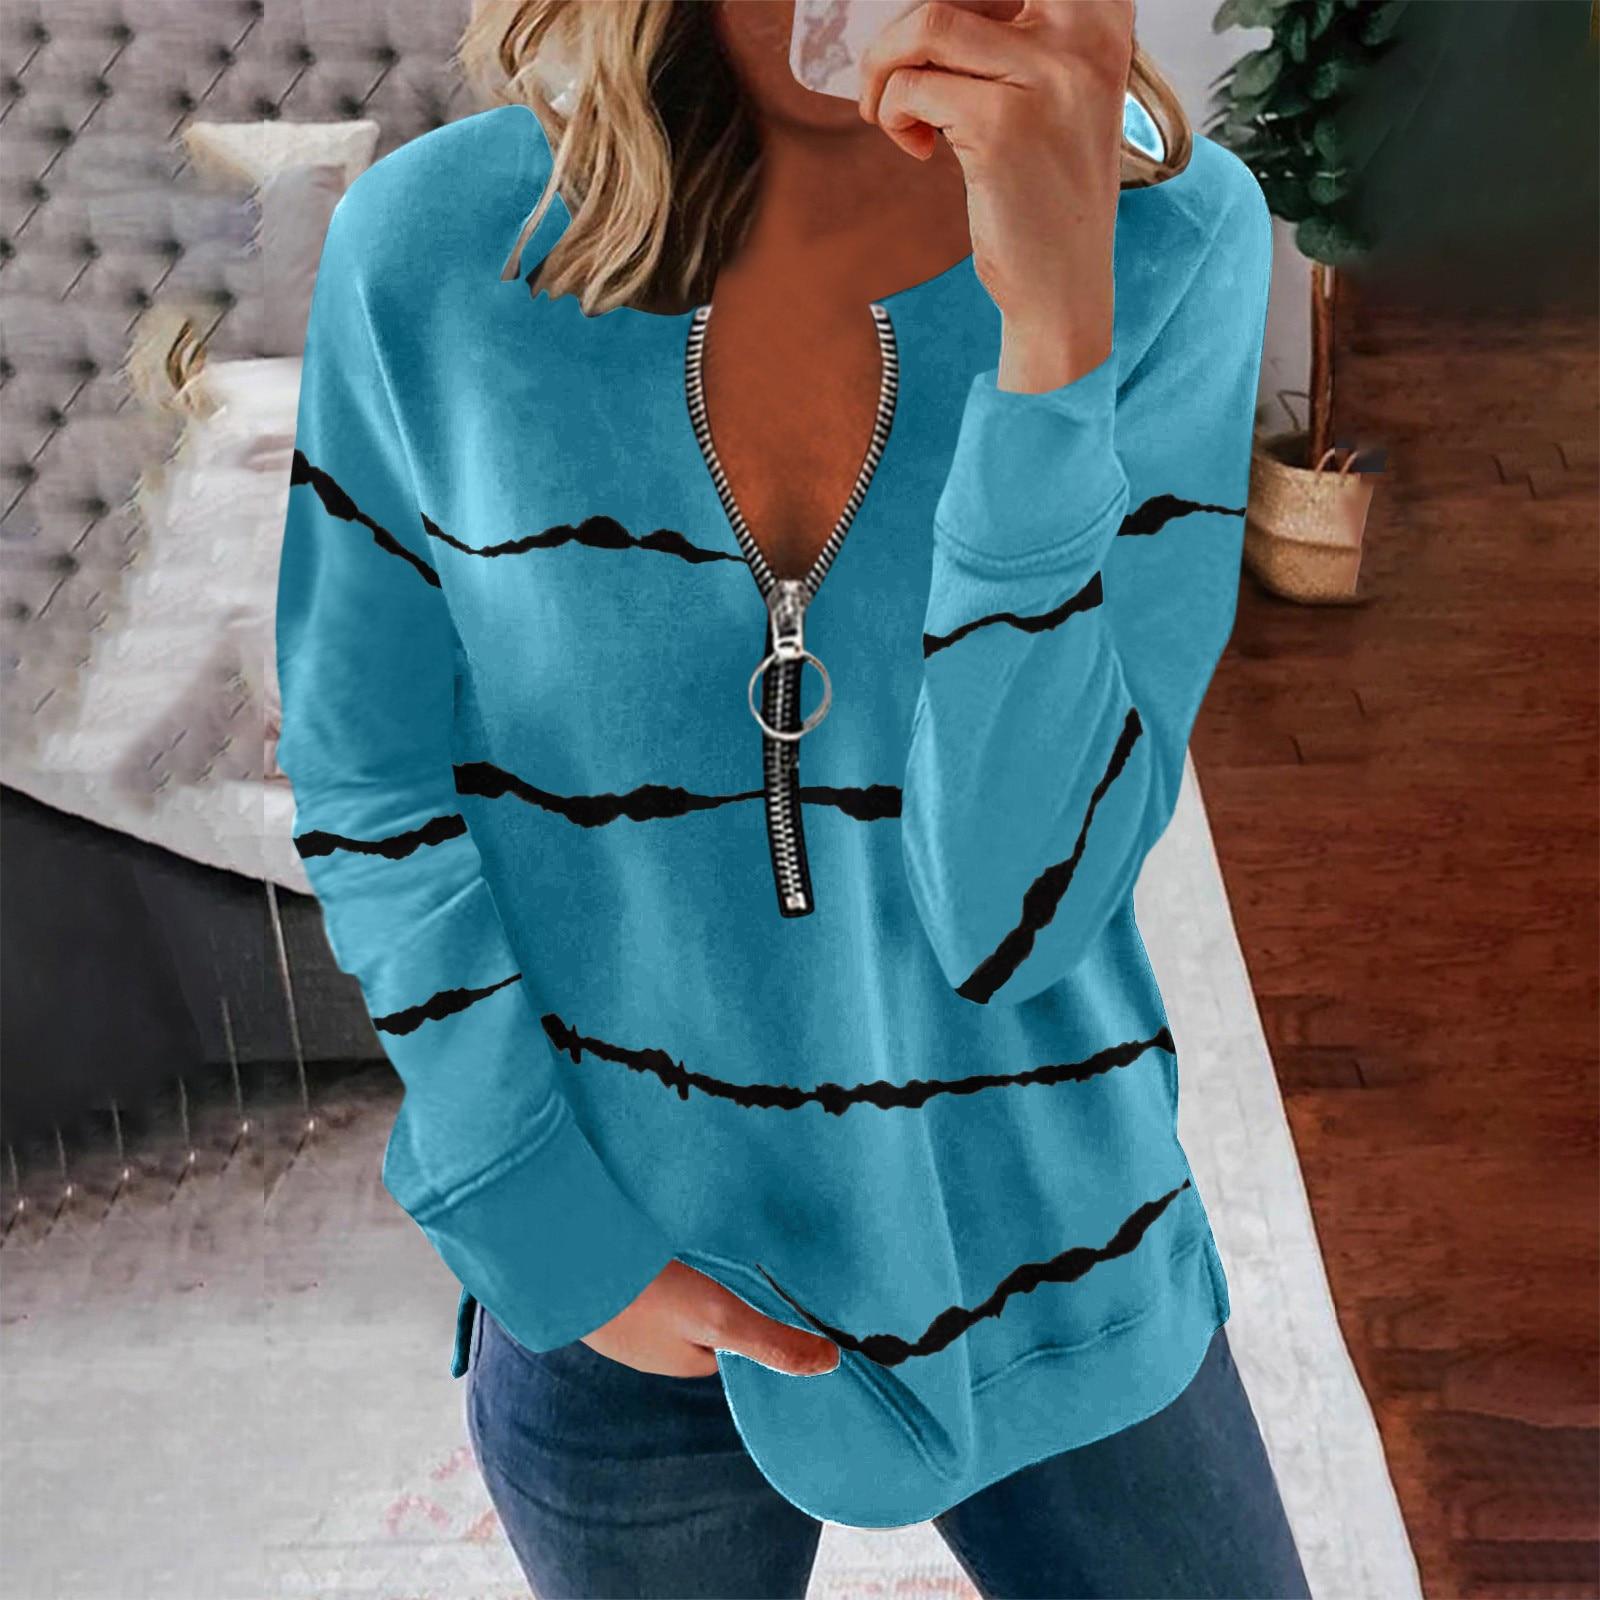 Blusa informal De manga larga con estampado a rayas para verano, camisa...